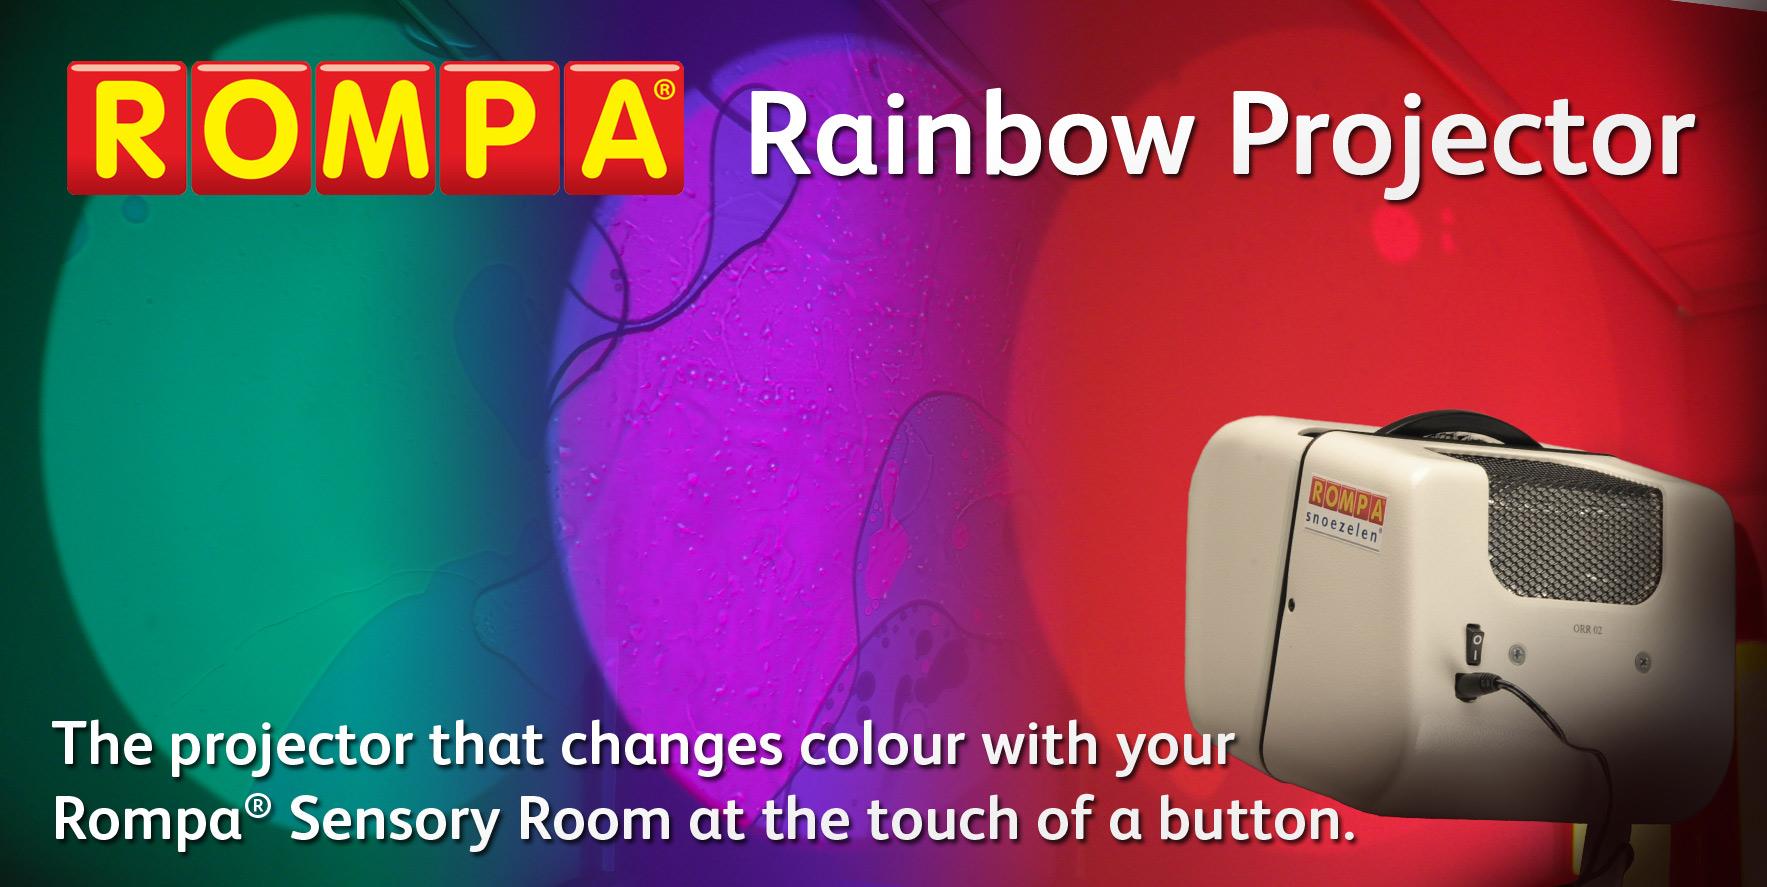 Rompa Rainbow Projector